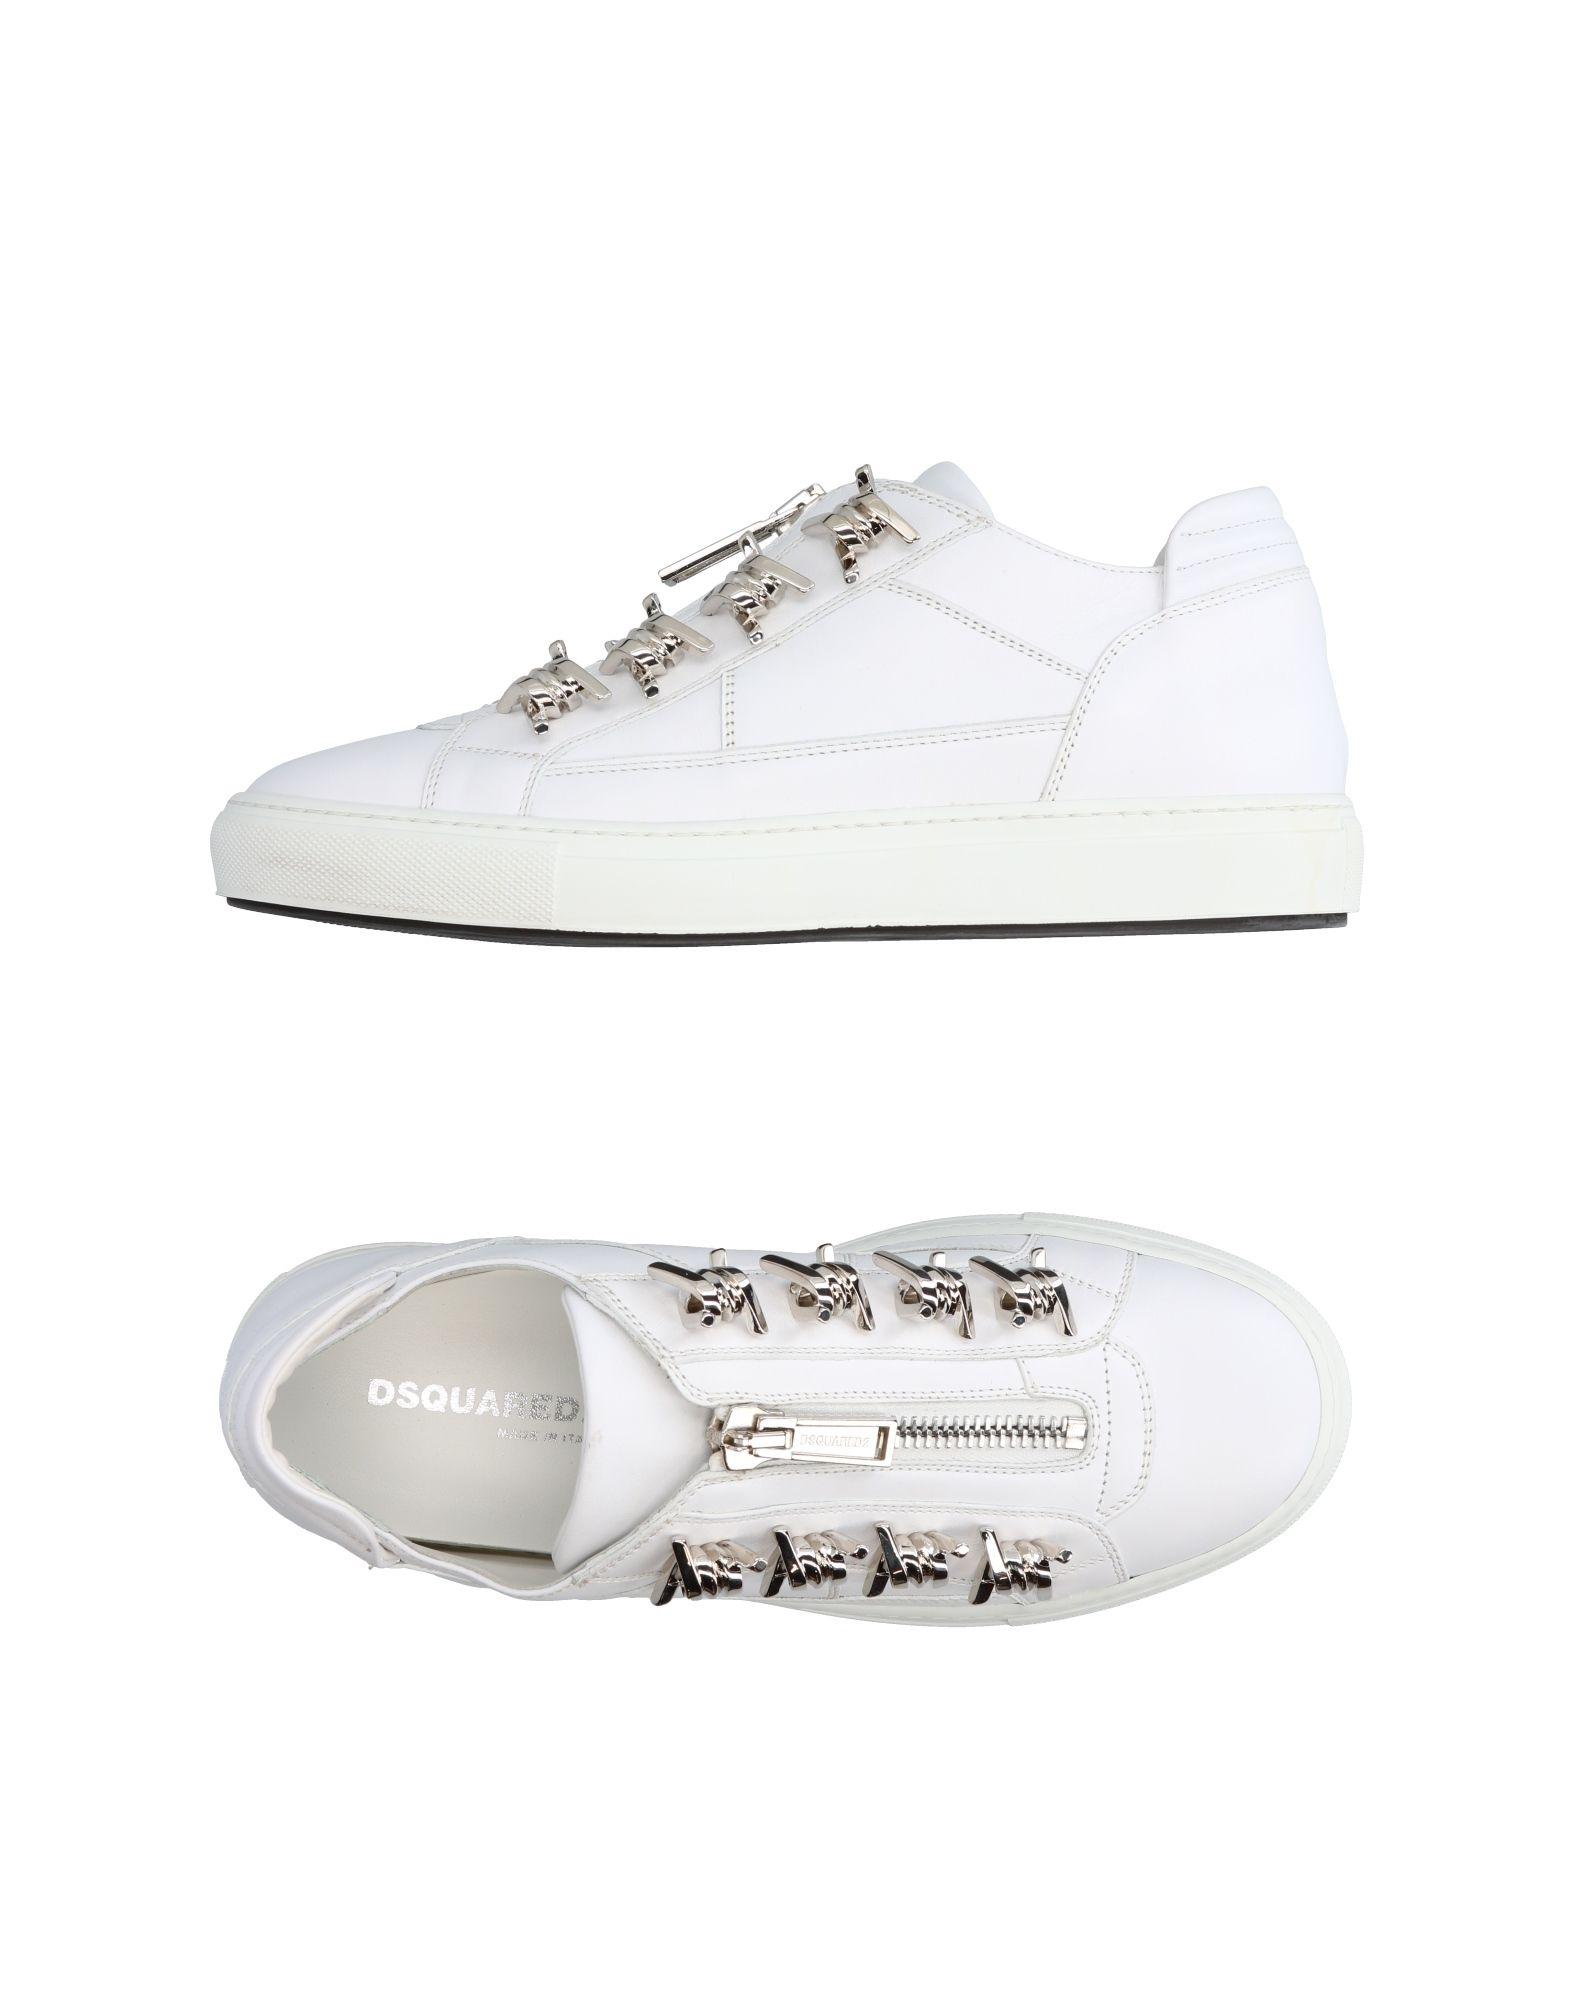 Dsquared2 Sneakers Herren  11298915AQ Gute Qualität beliebte Schuhe